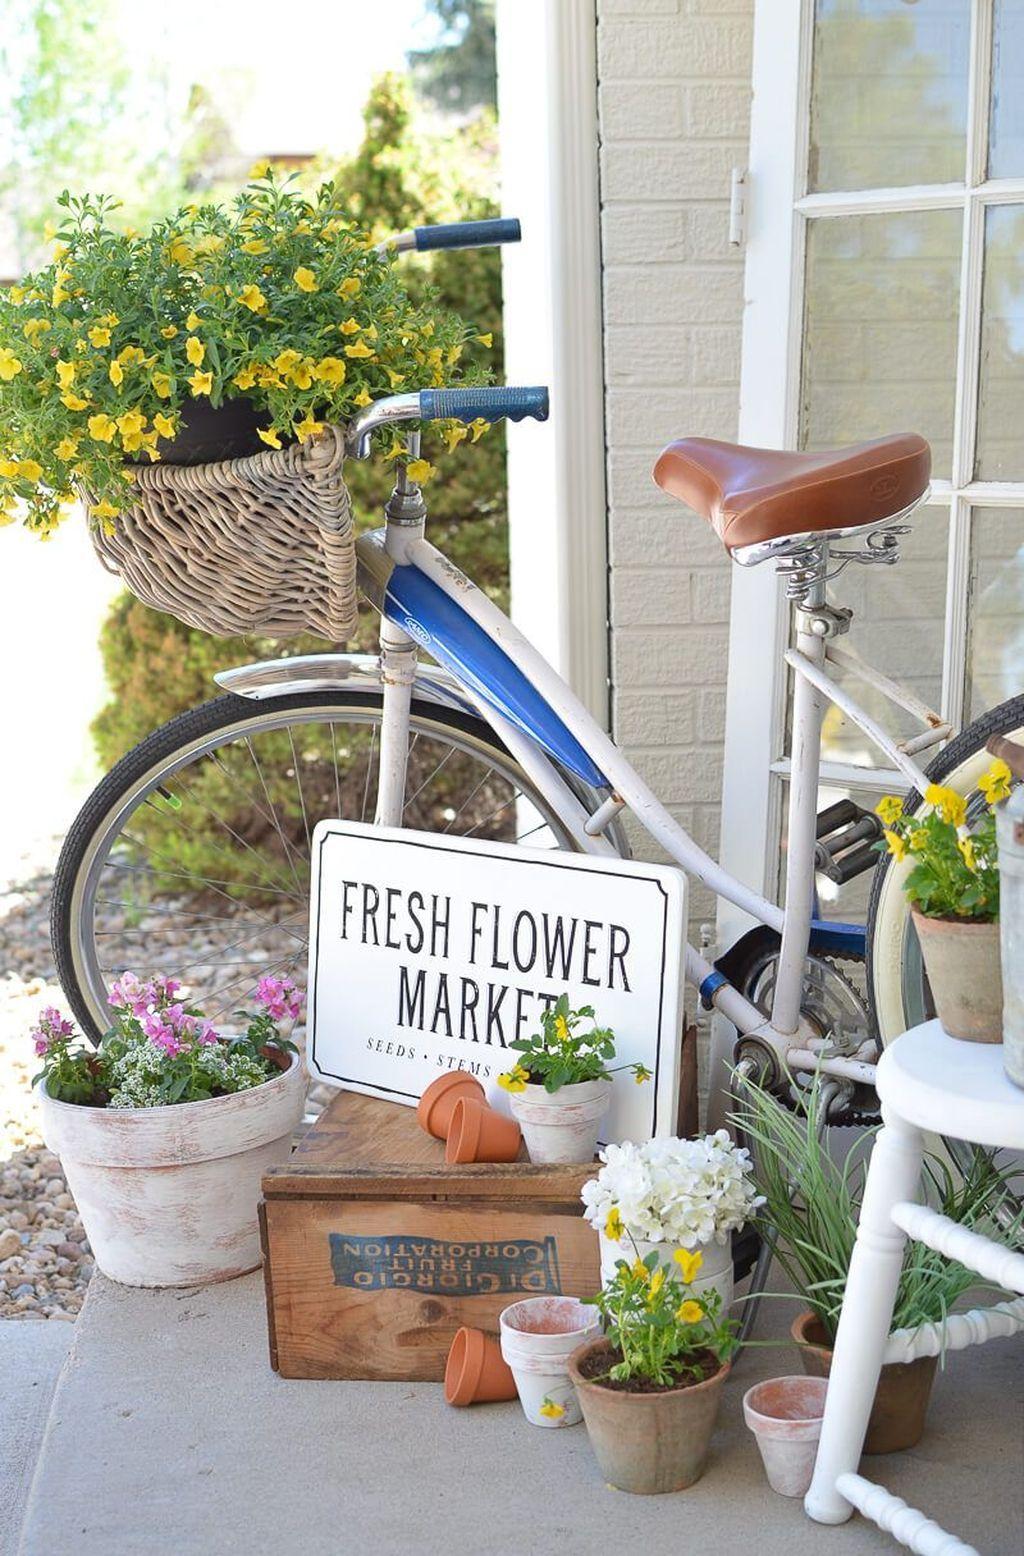 40 Gorgeous Spring Outdoor Decor Ideas Trendehouse Spring Porch Decor Spring Outdoor Decor Spring Porch